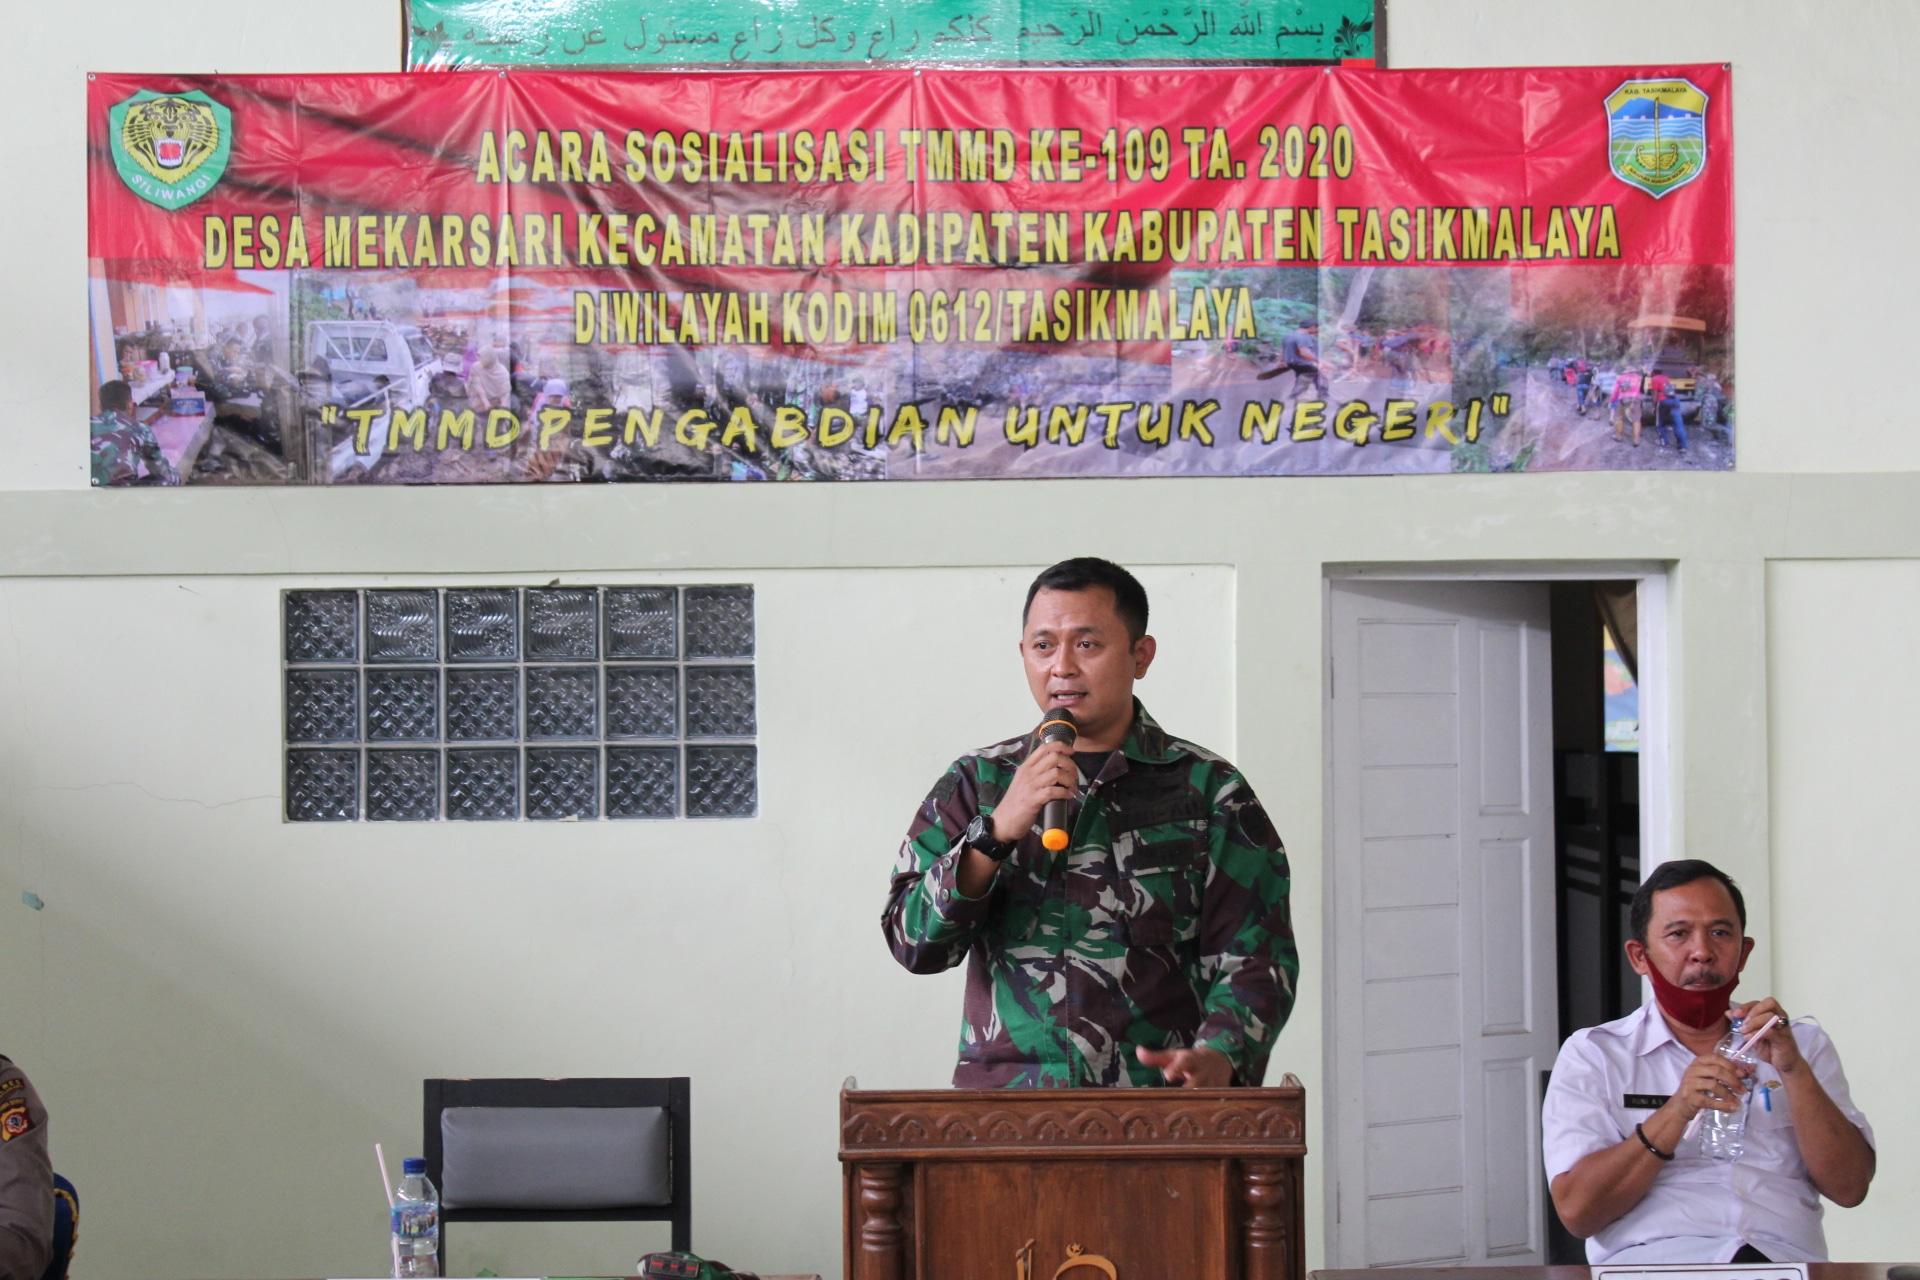 Dandim 0612/Tasikmalaya Menggelar Sosialisasi TMMD Ke-109 Ta.2020 Desa Mekarsari Kecamatan Kadipaten Kabupaten Tasikmalaya